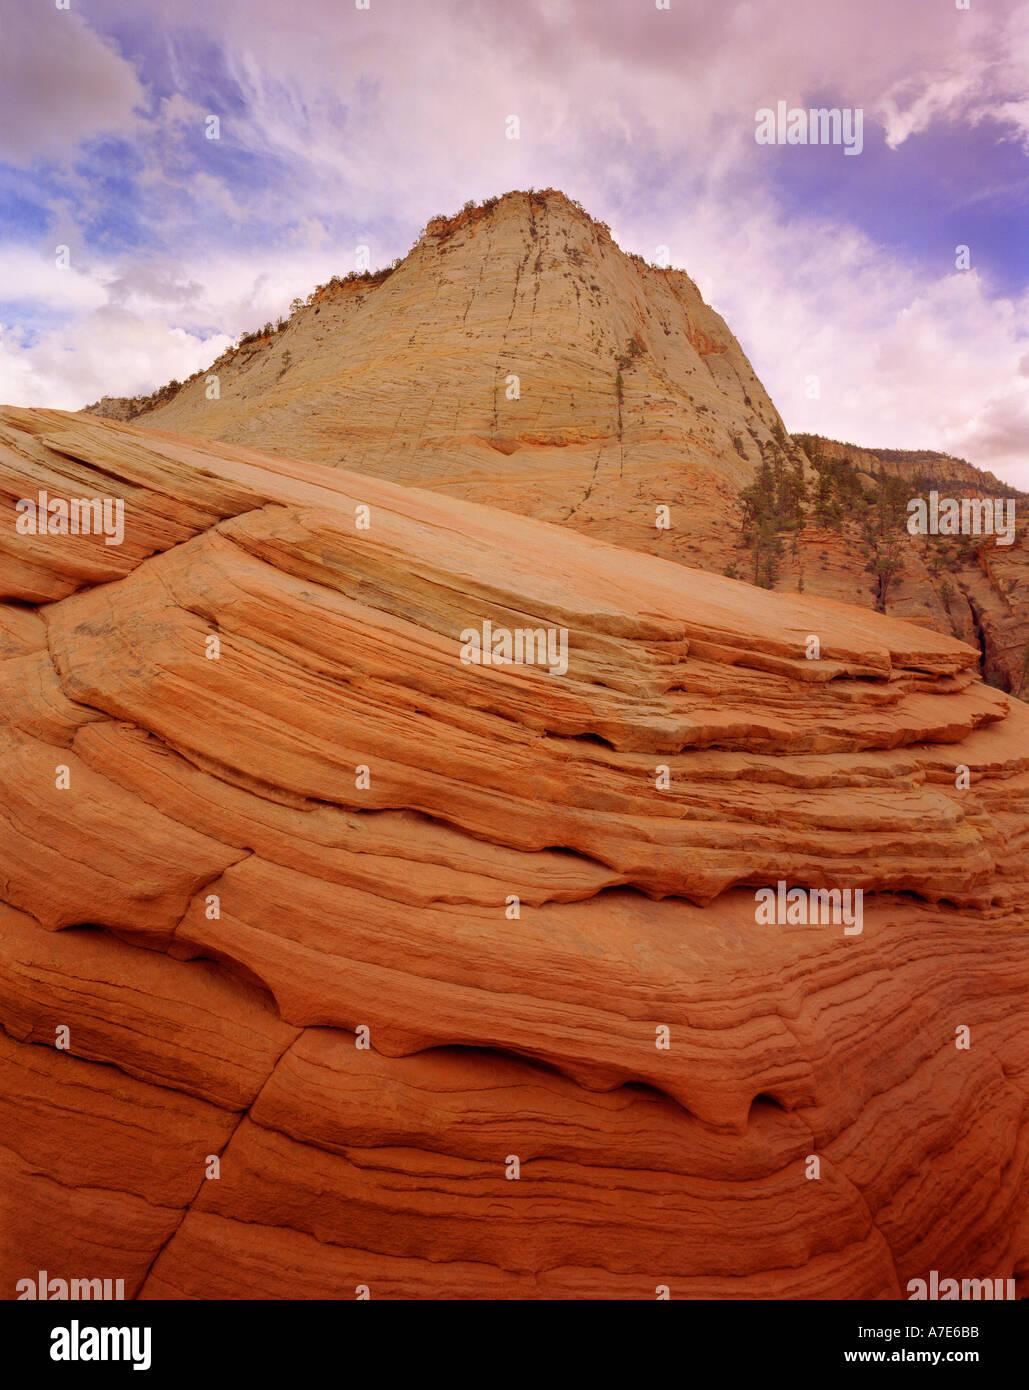 Chequerboard Mesa Zion National Park Utah USA - Stock Image